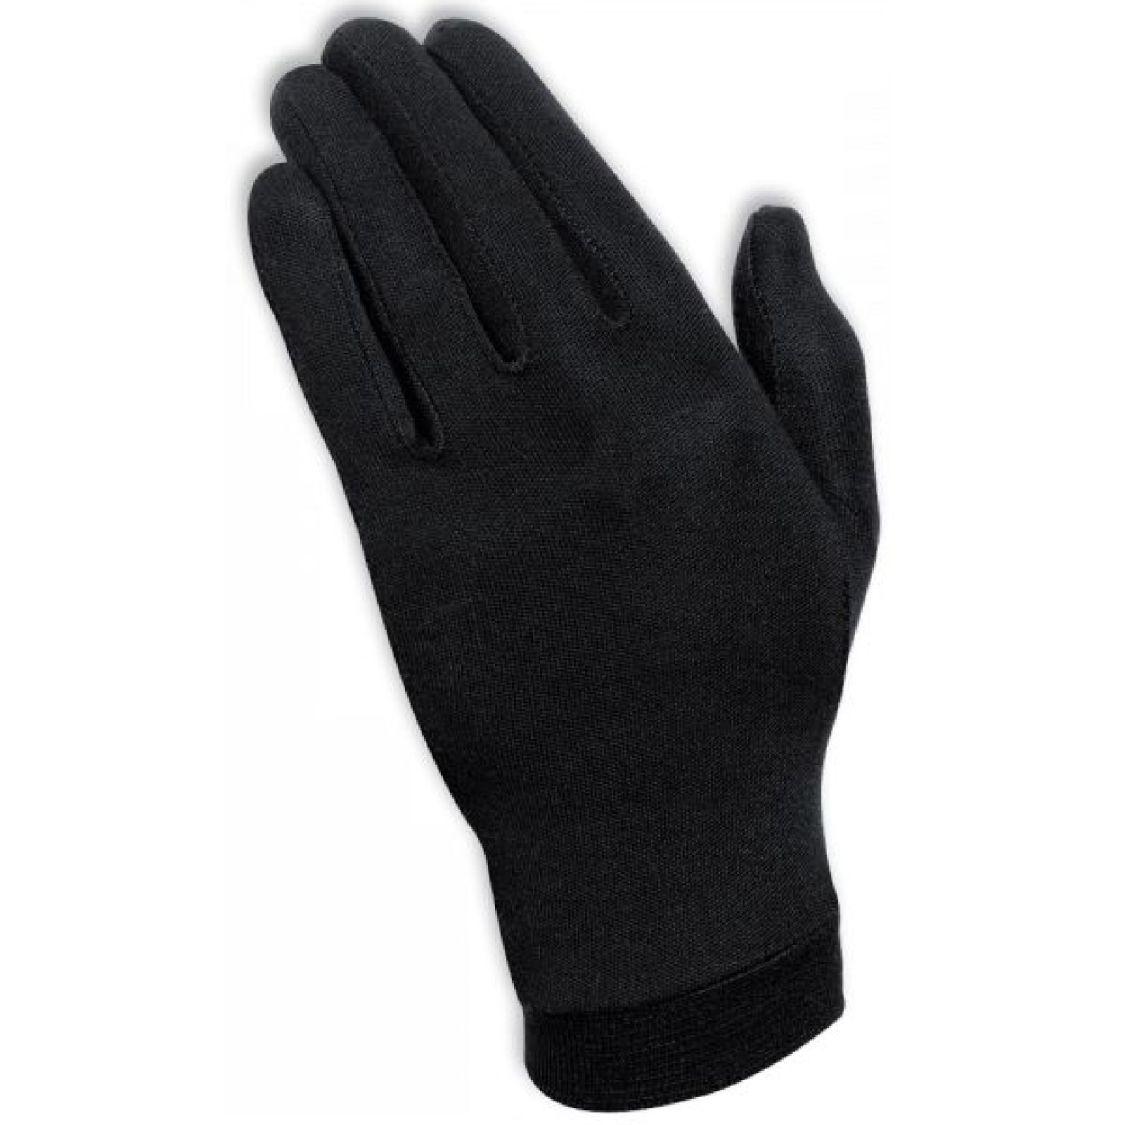 HELD Unterziehhandschuhe Handschuhe Motorrad Silk Roller 2132 SEIDE schwarz